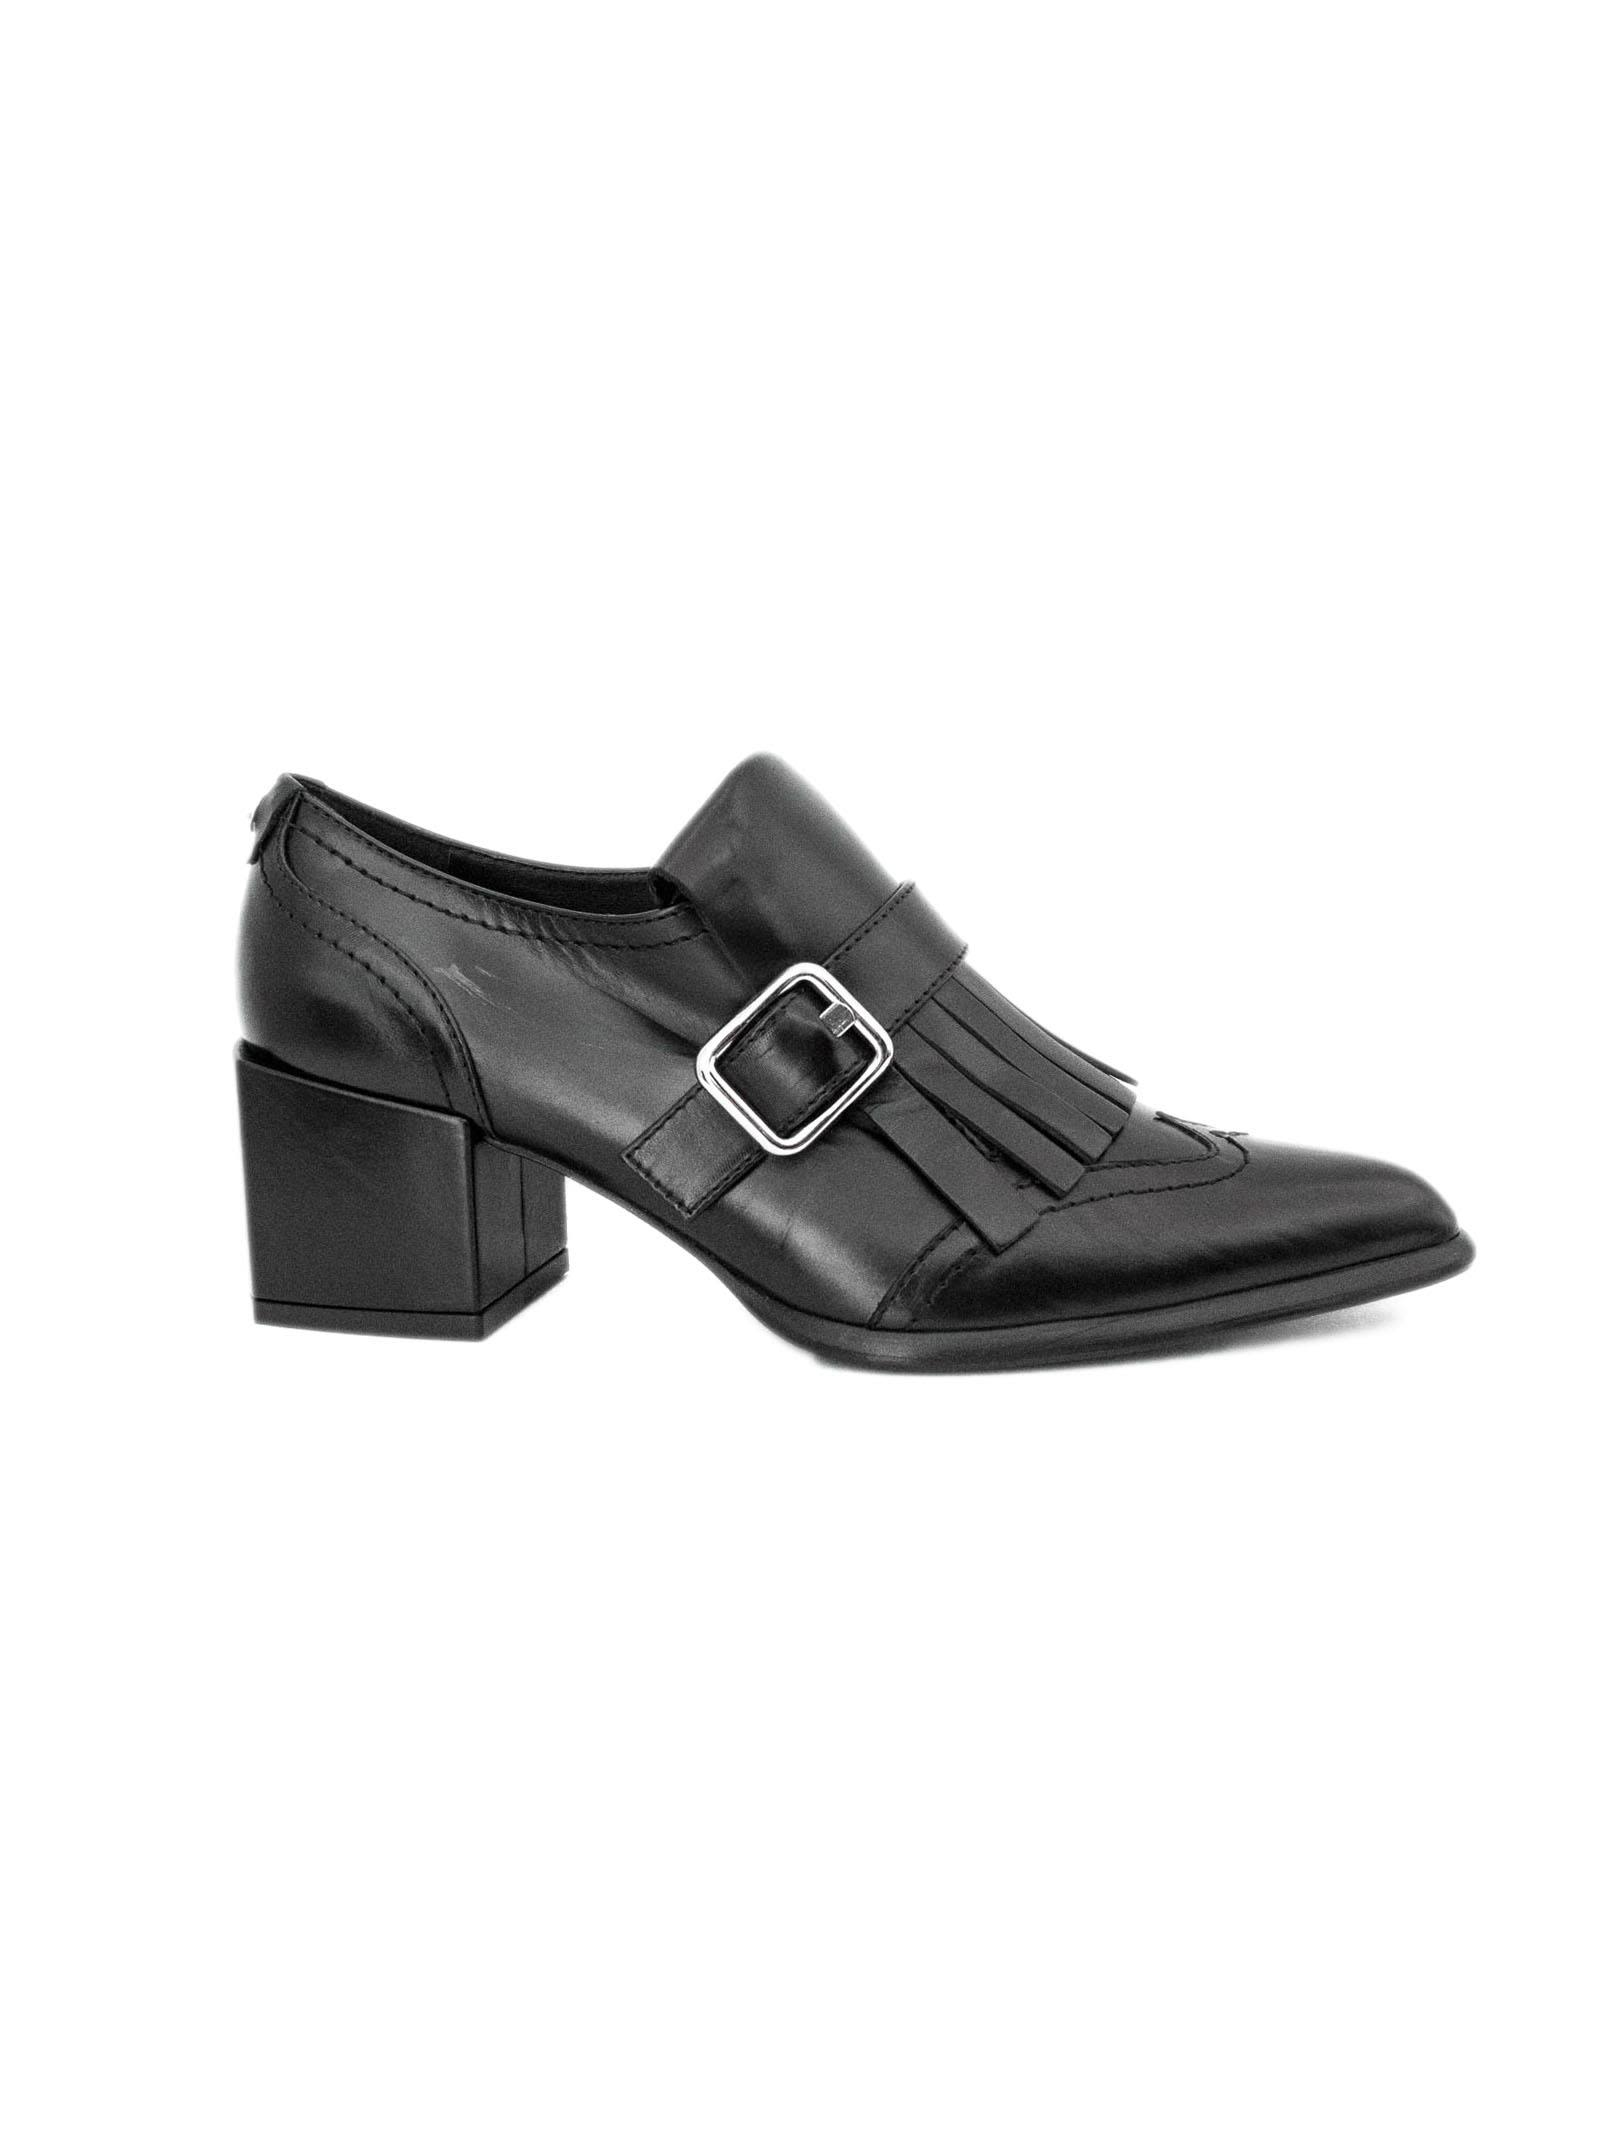 ROBERTO FESTA Daria Shoes In Black Leather. in Nero